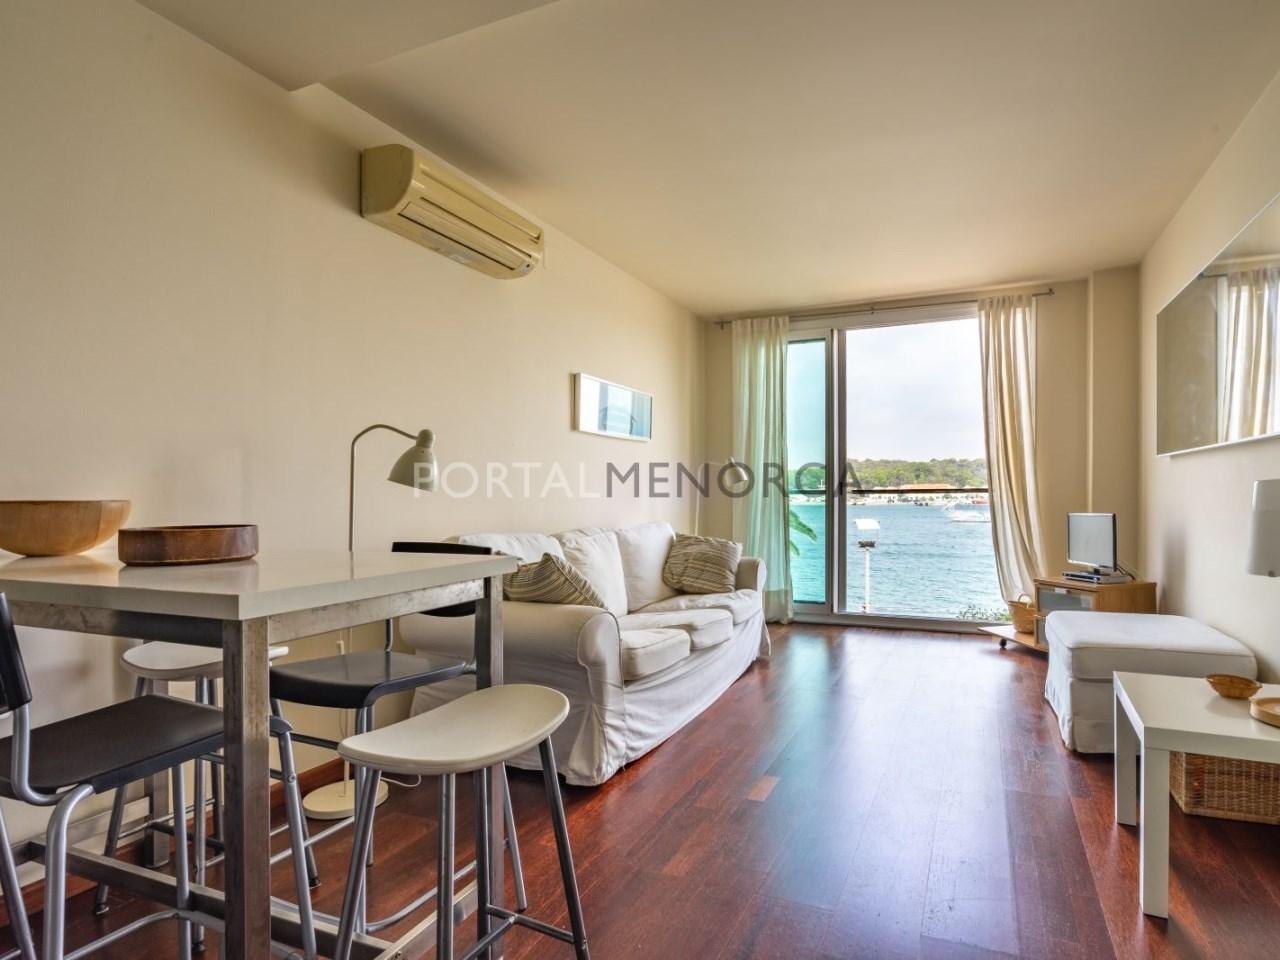 buy-house-apartment-menorca (2)